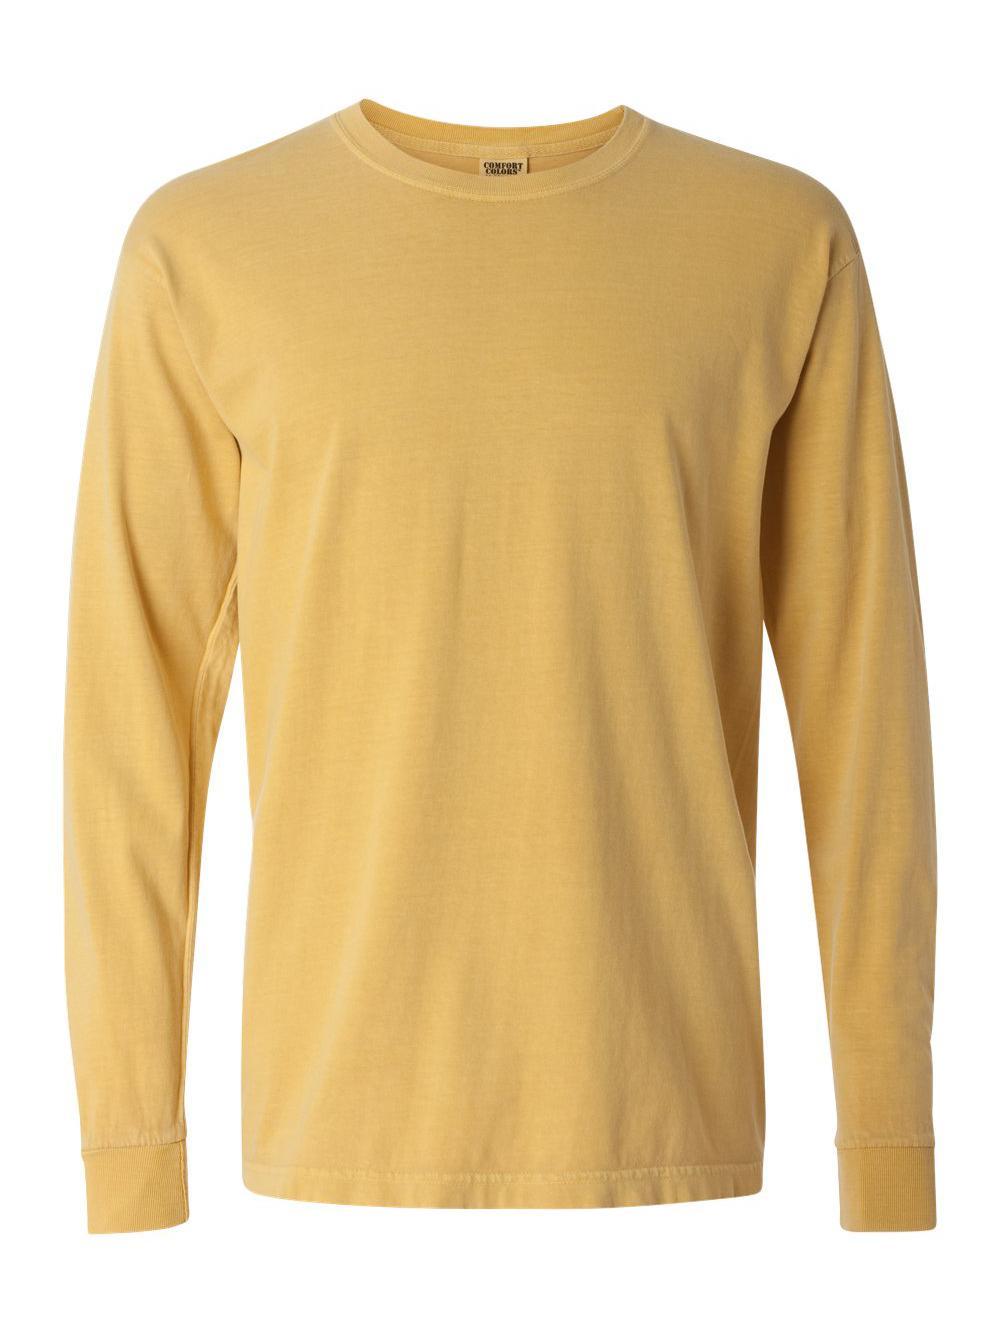 Comfort-Colors-Garment-Dyed-Heavyweight-Ringspun-Long-Sleeve-T-Shirt-6014 thumbnail 54